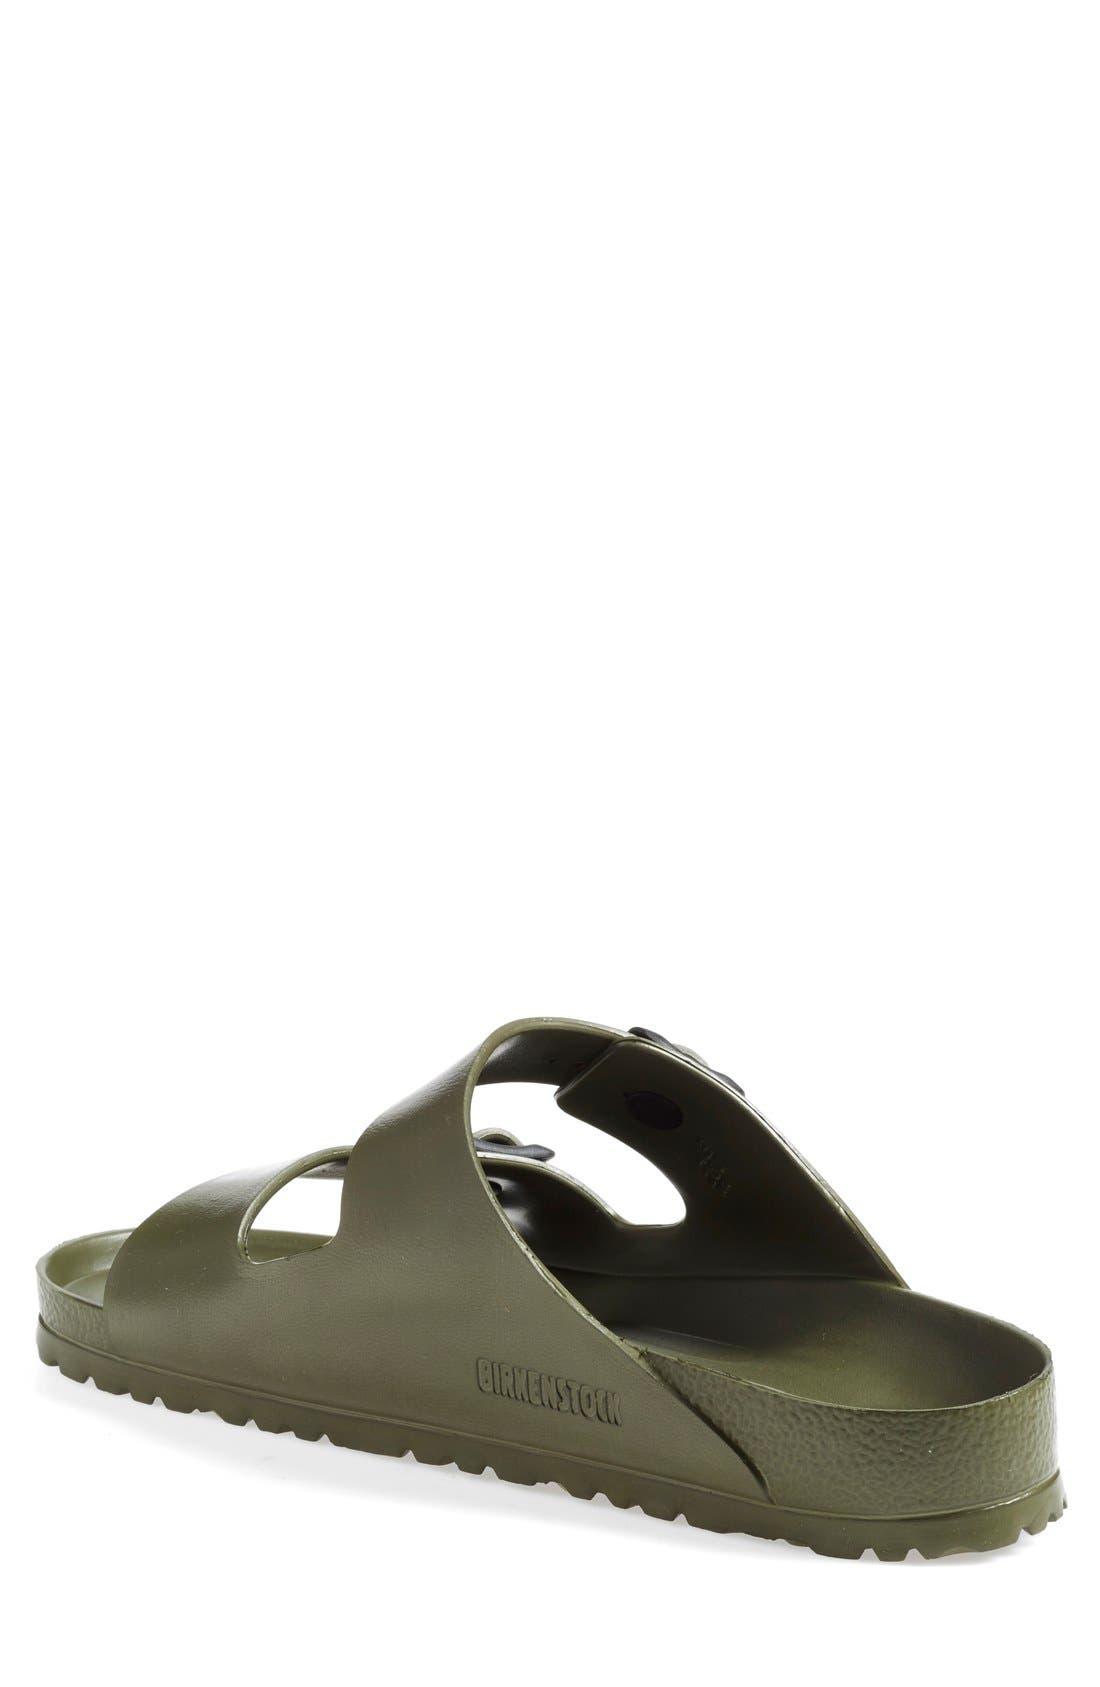 'Essentials - Arizona EVA' Waterproof Slide Sandal,                             Alternate thumbnail 8, color,                             GREEN